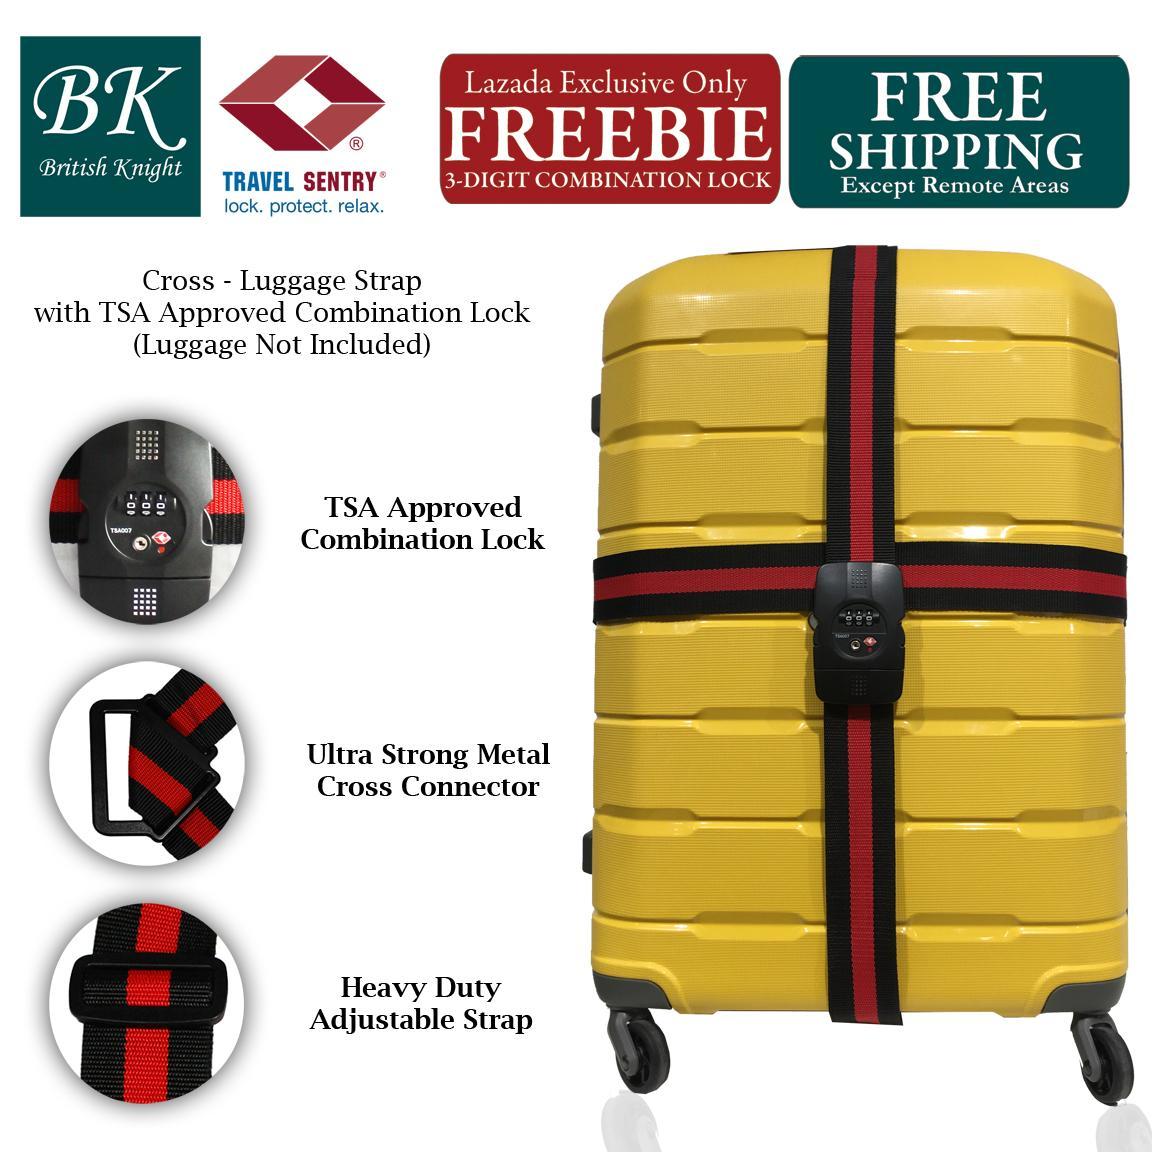 19c7311813d1 British Knight XAC001 TSA Approved Luggage Cross Strap Belt (Free Separate  3-Digit Combination Lock)